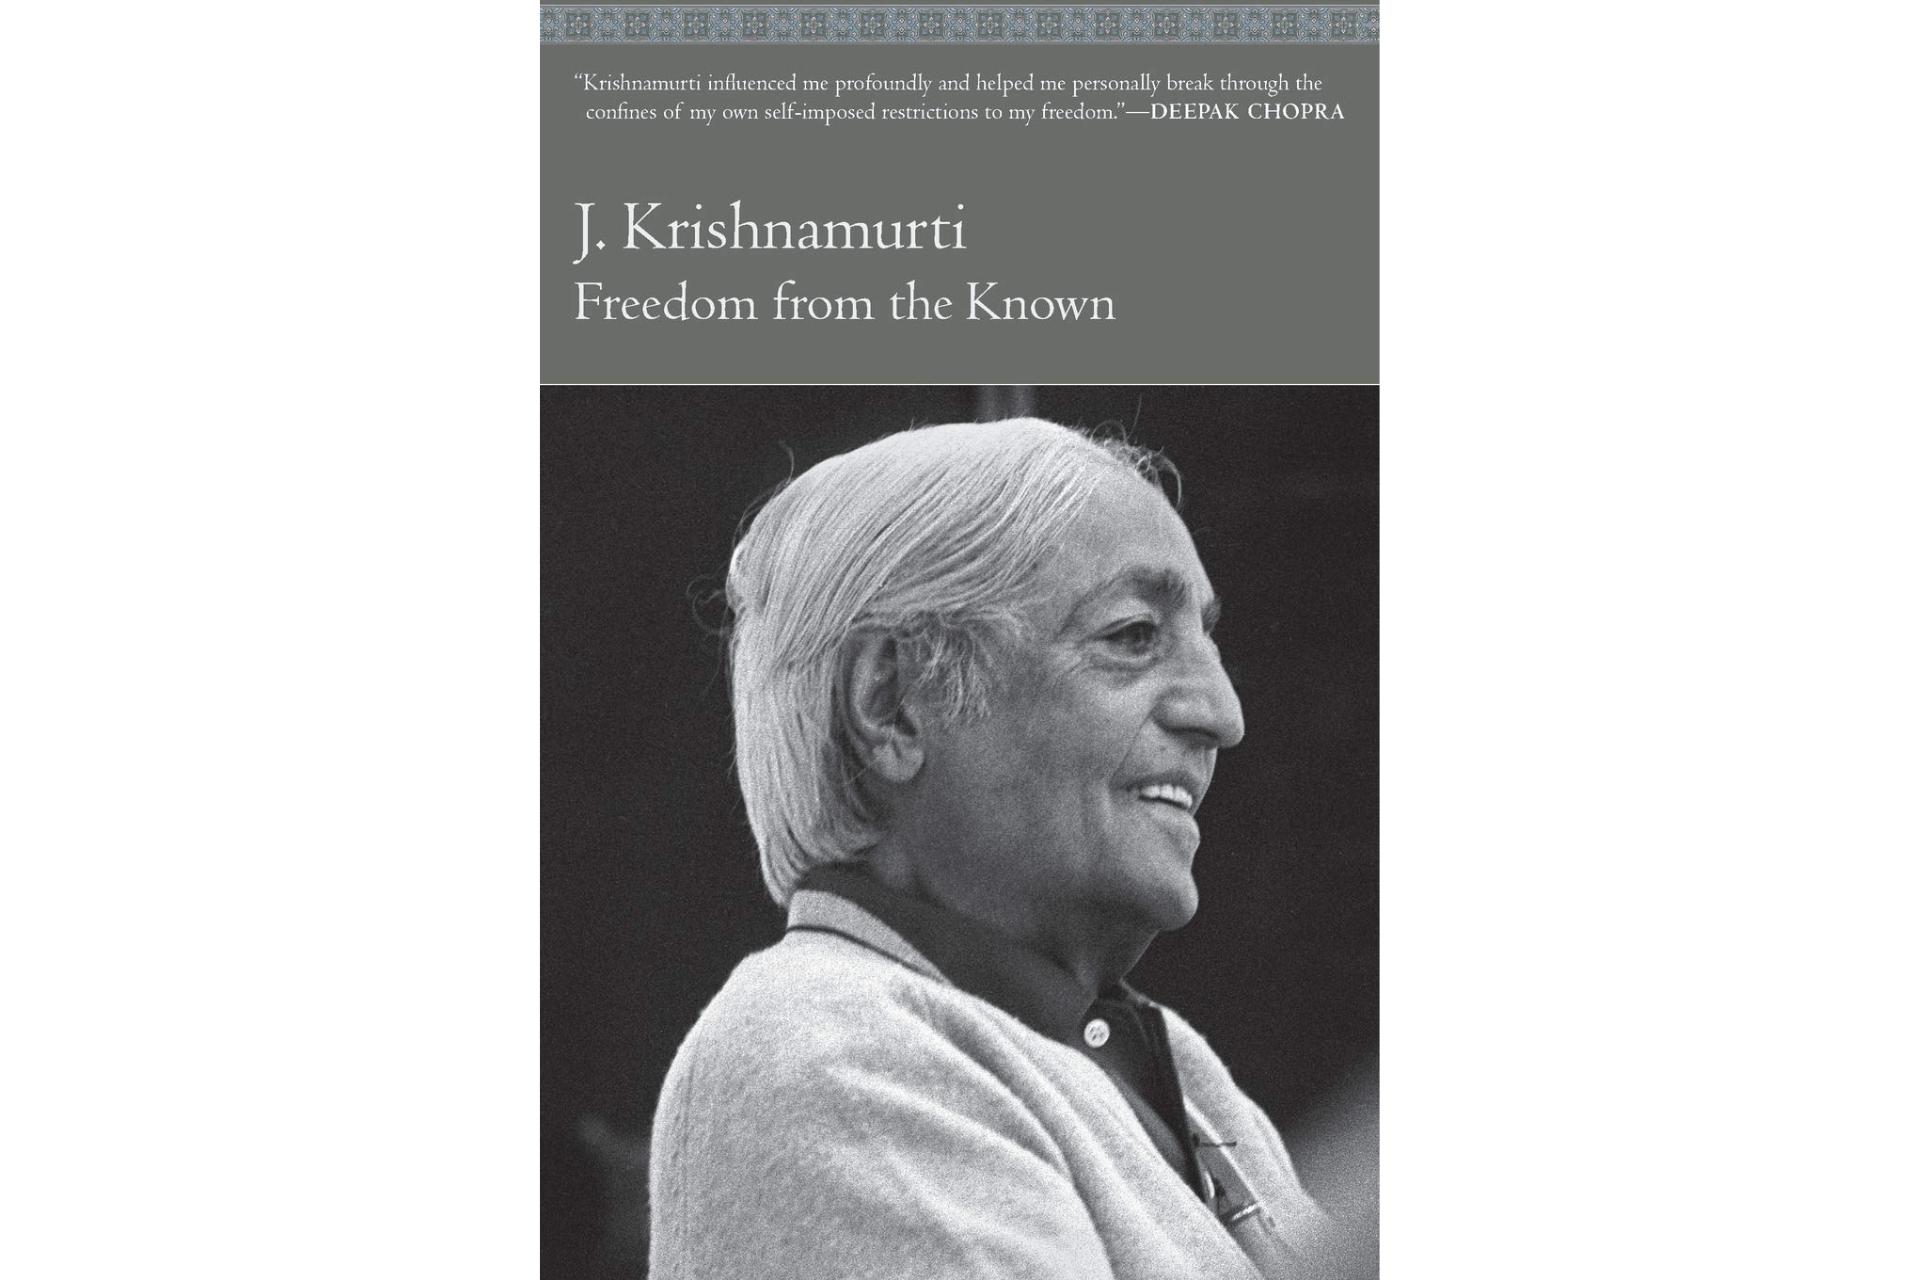 Freedom from the Known by Jiddu Krishnamurti